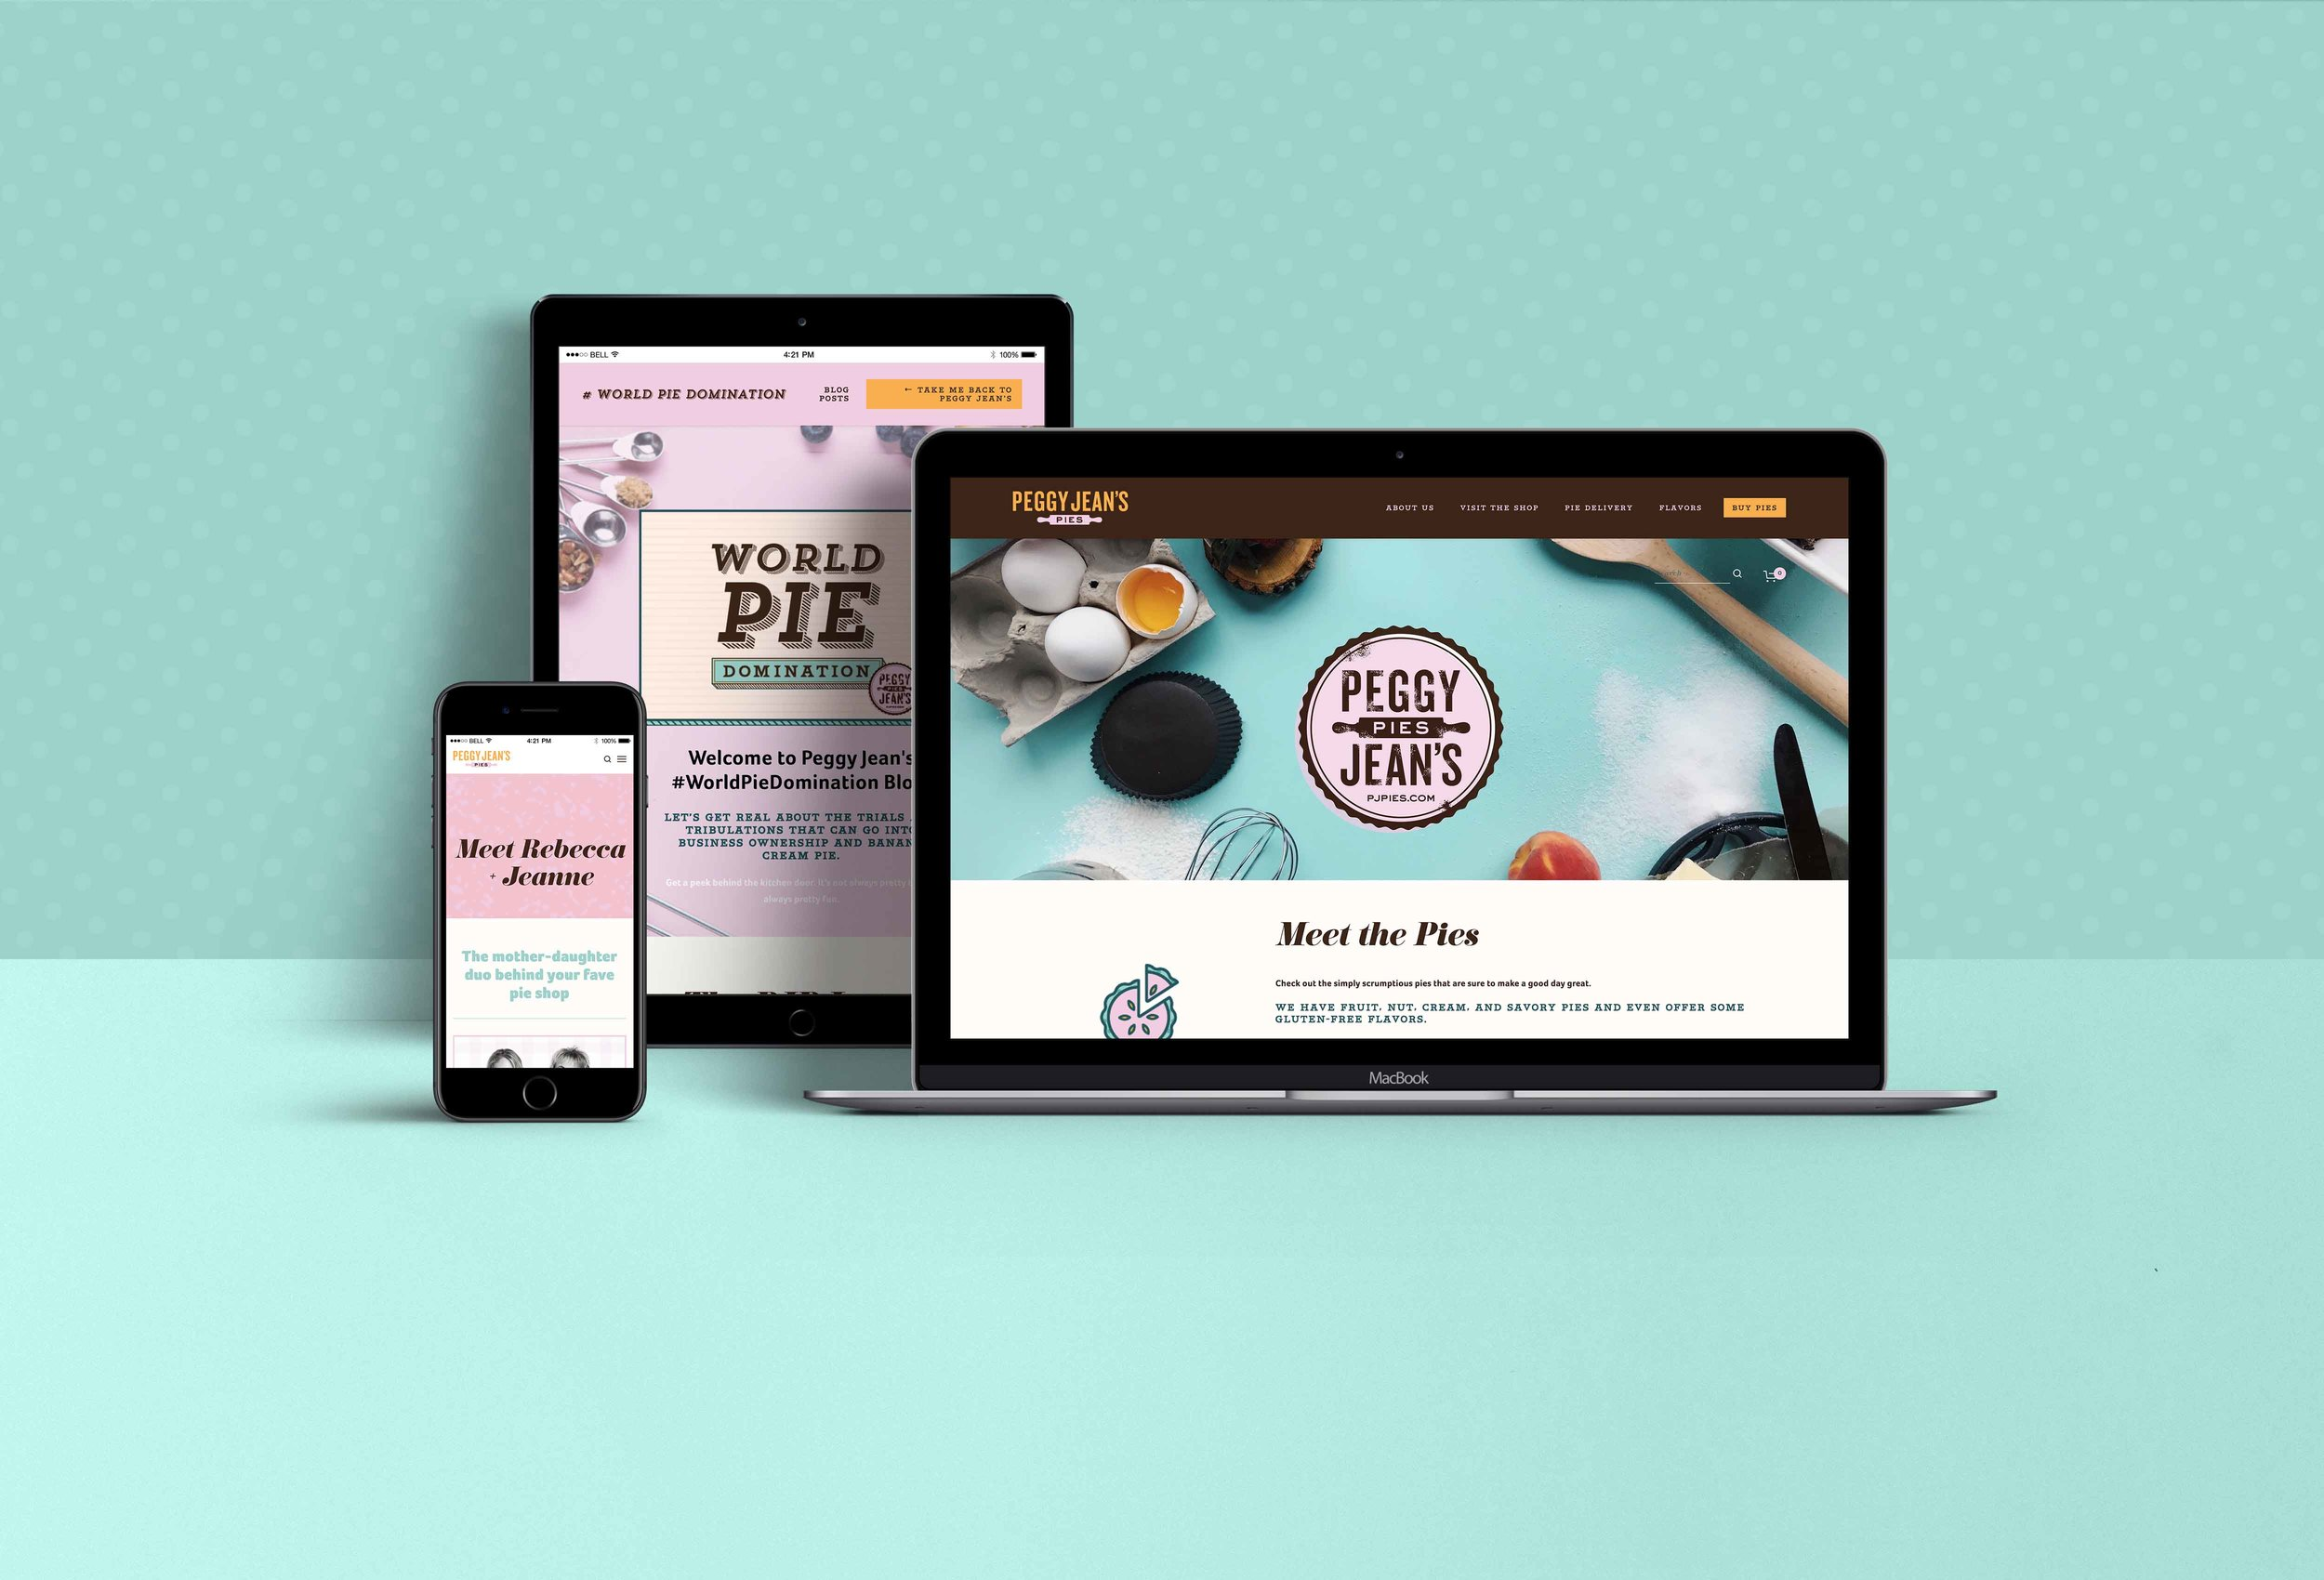 Web-Showcase-Project-Presentation_under500k.jpg